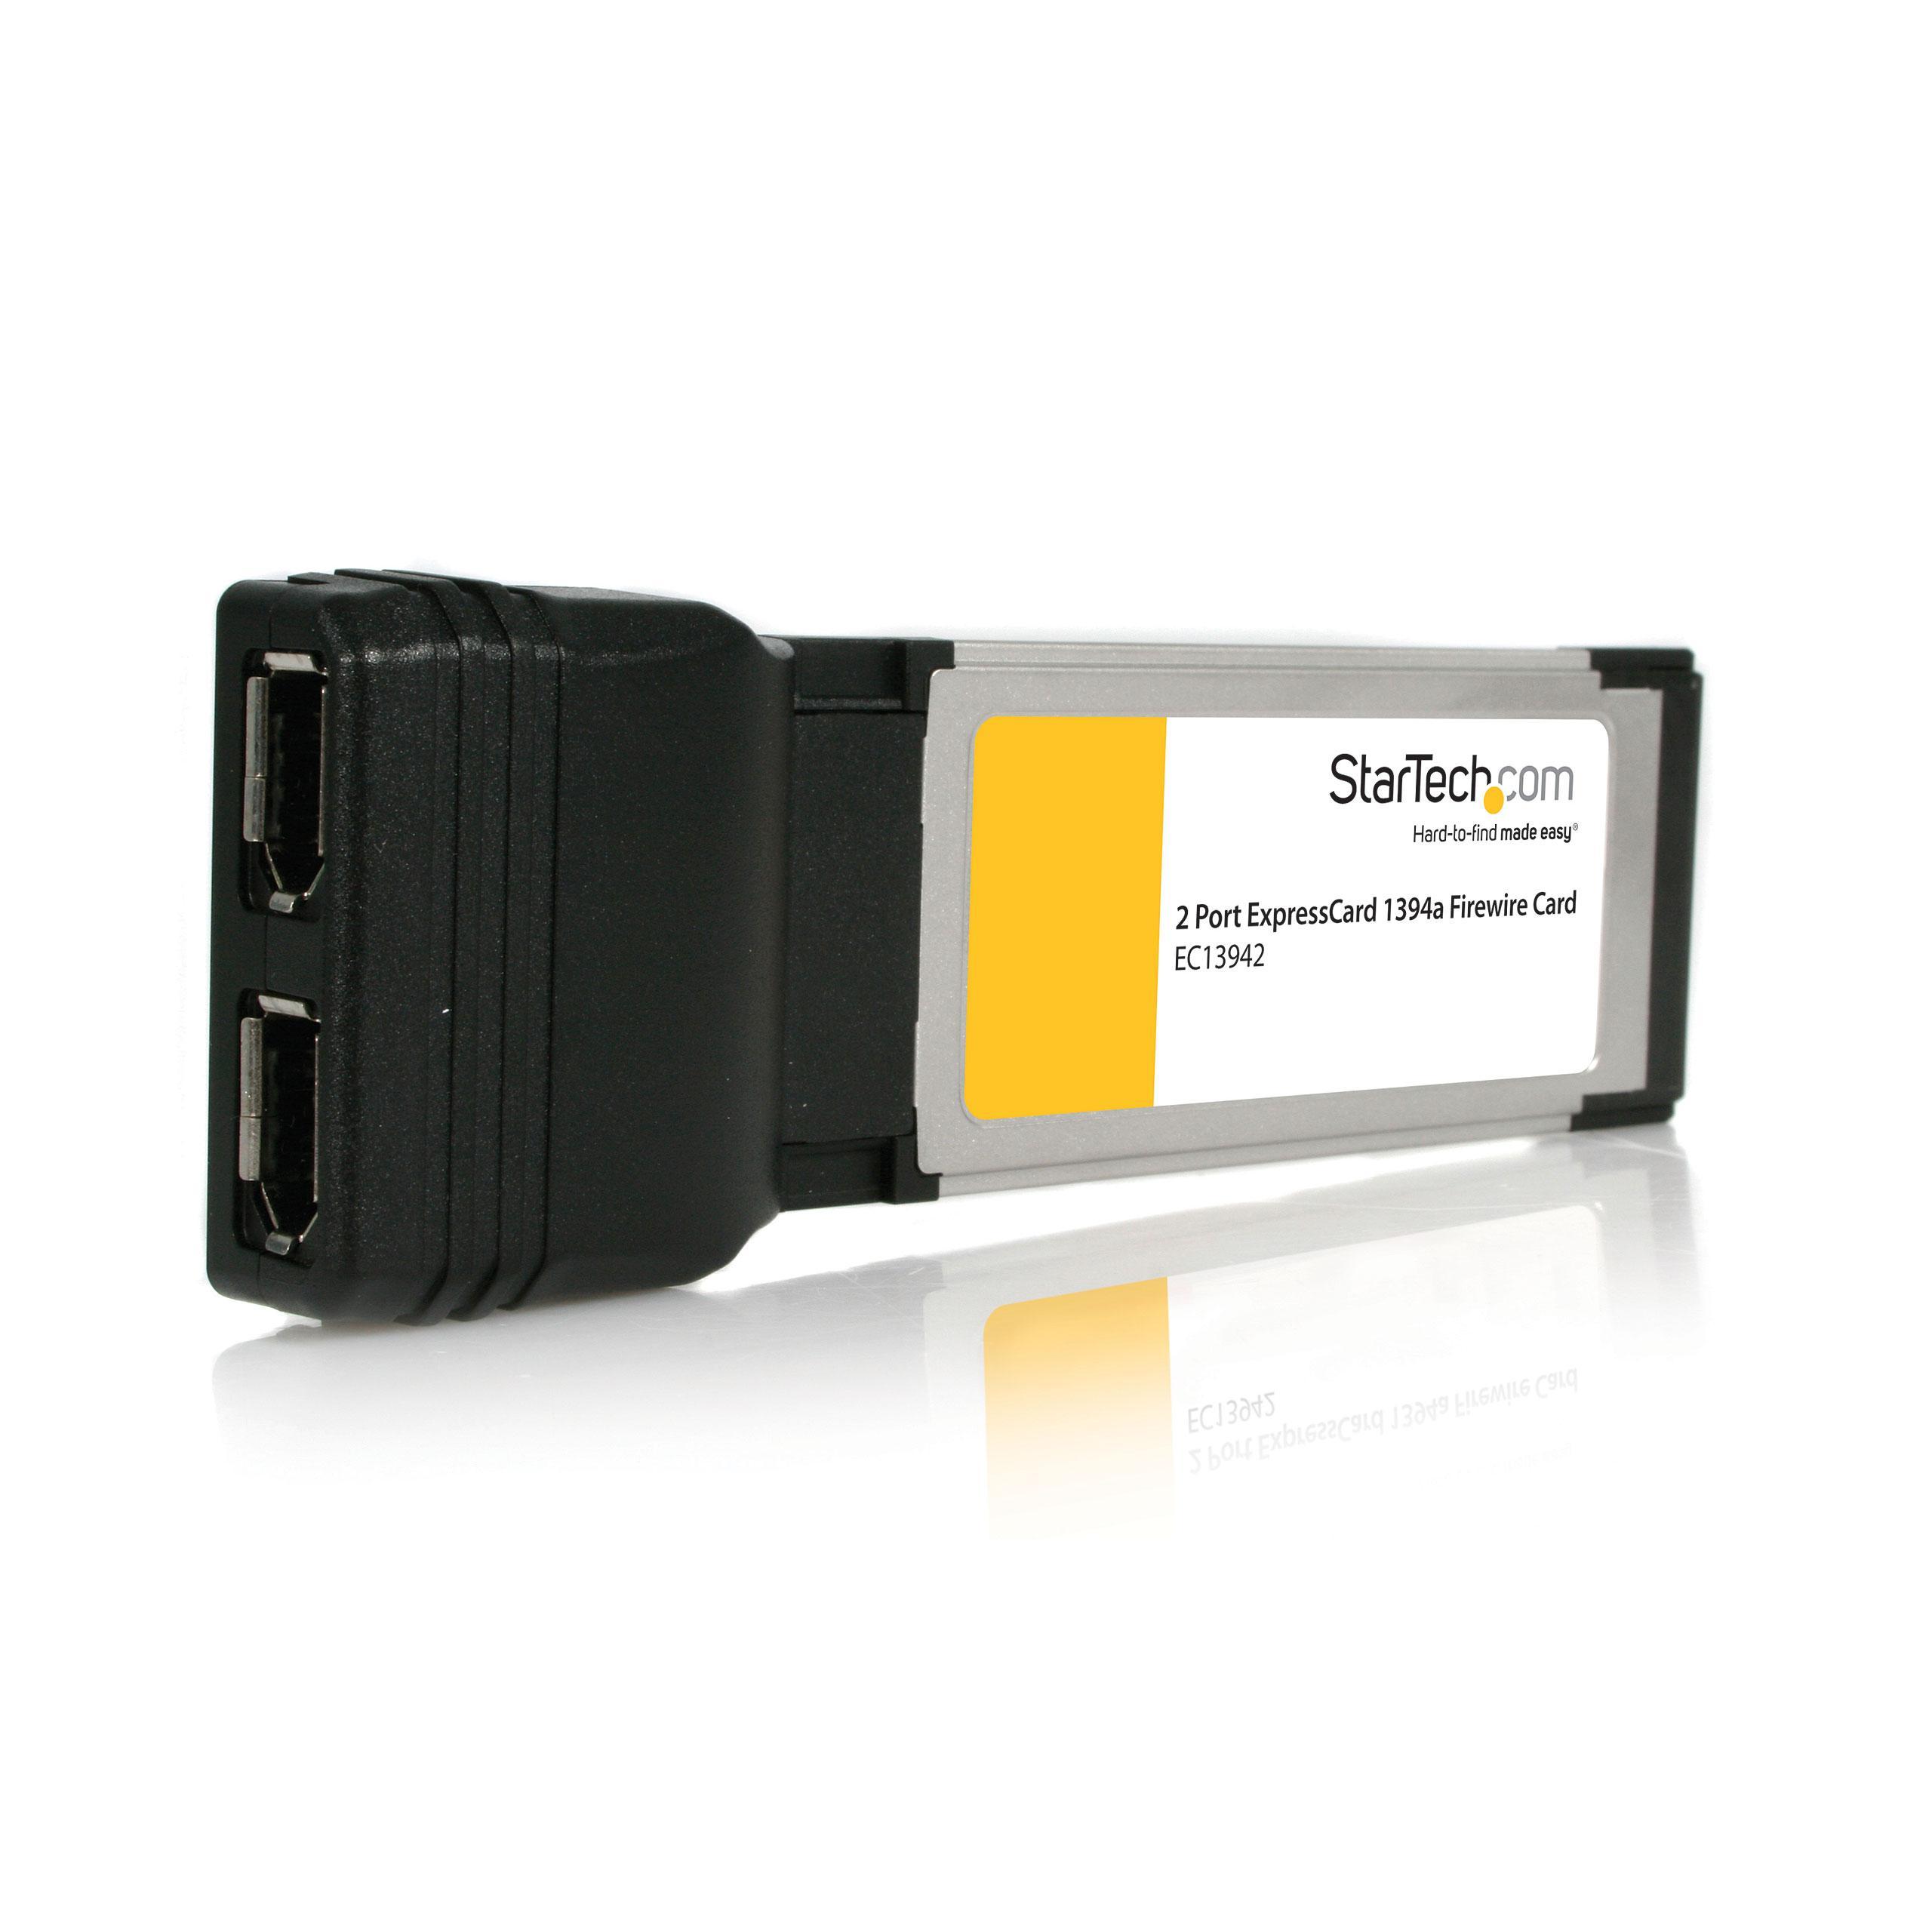 Amazon.com: StarTech.com 2 Port ExpressCard Laptop 1394a Firewire ...